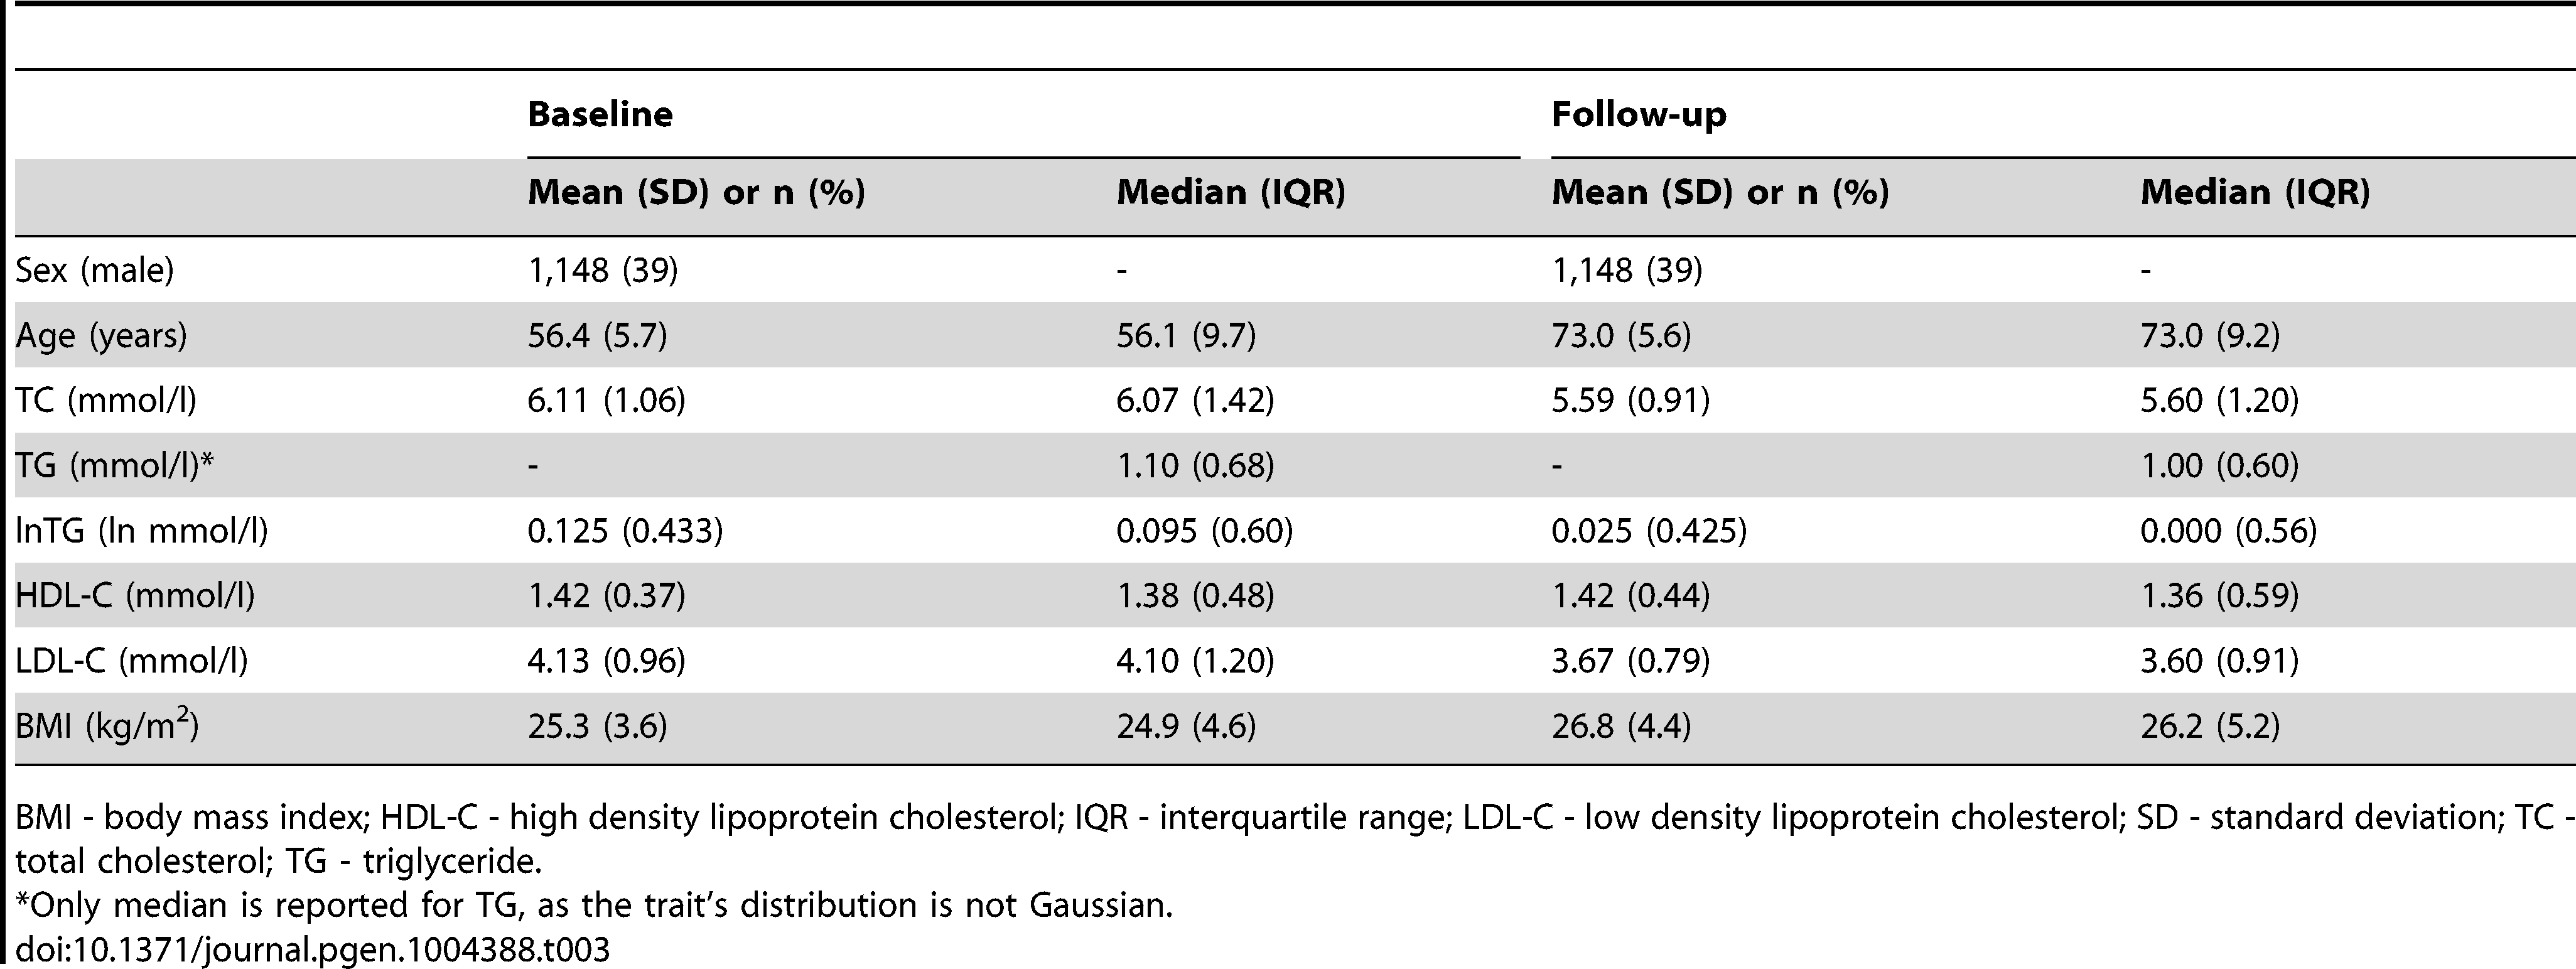 Longitudinal characteristics of the MDC Study participants (N=2,943).